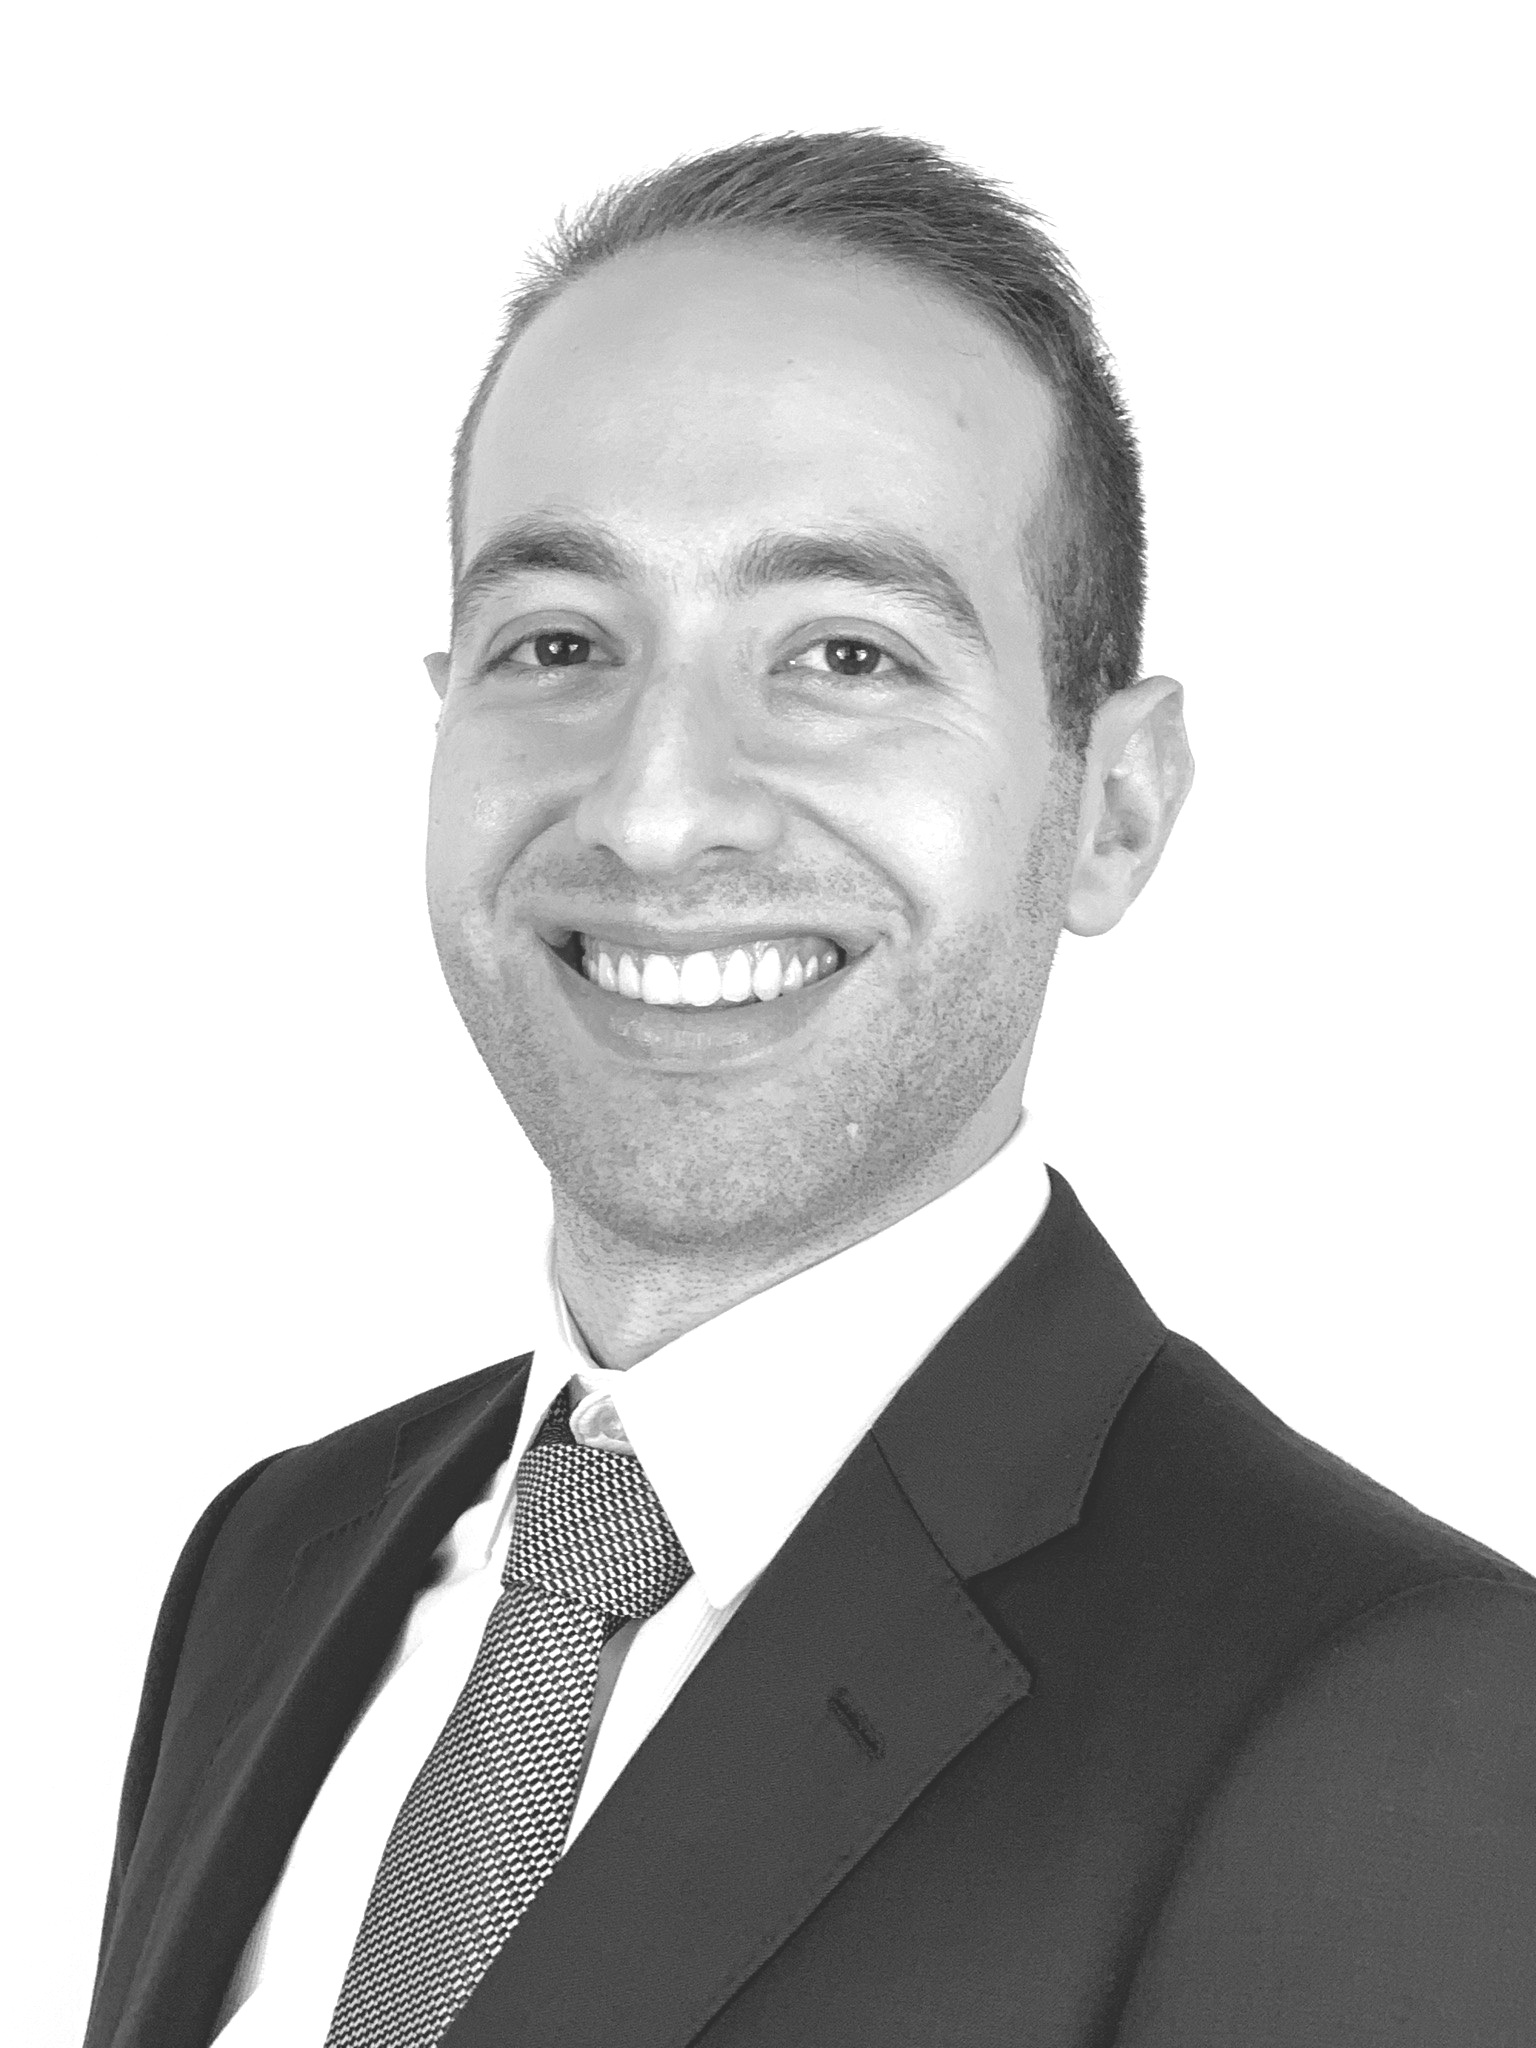 Giorgio Kringas - Business Analyst